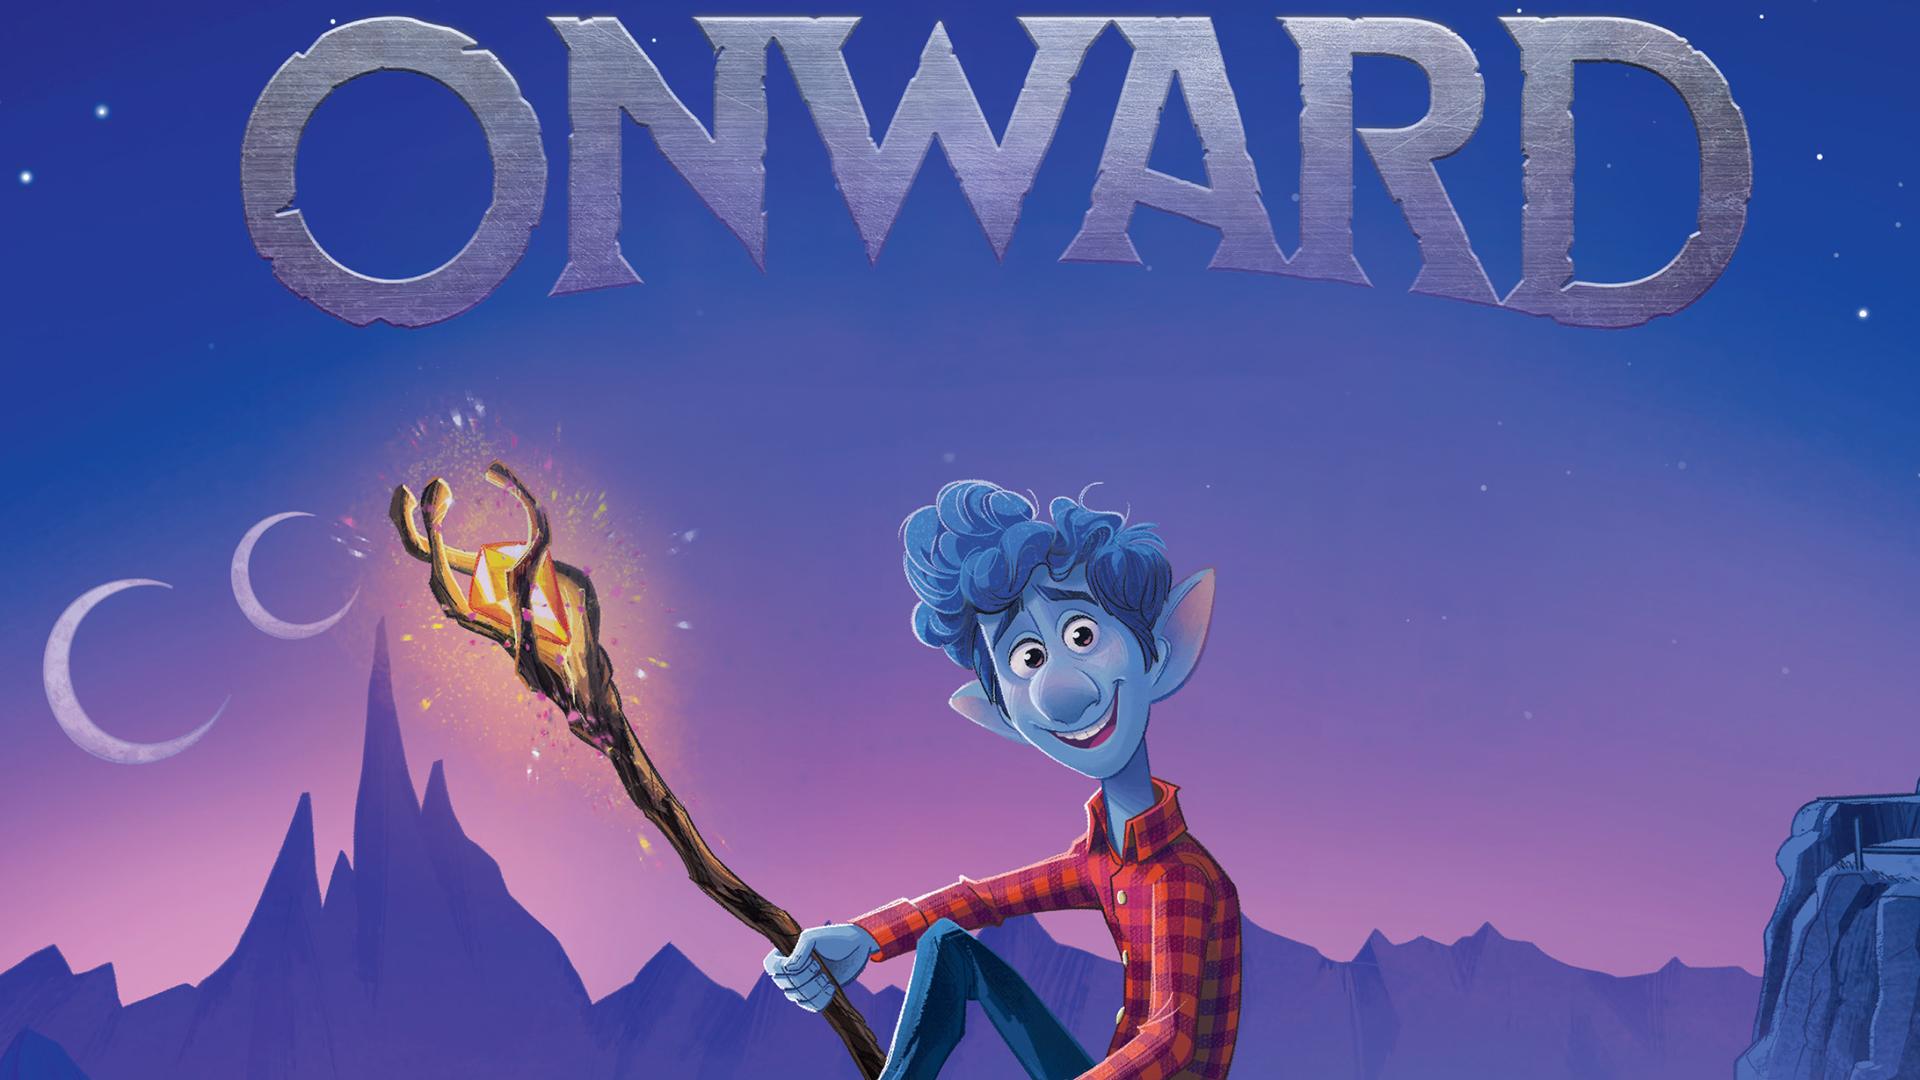 Pixar Onward Hd Wallpapers Youloveit Com